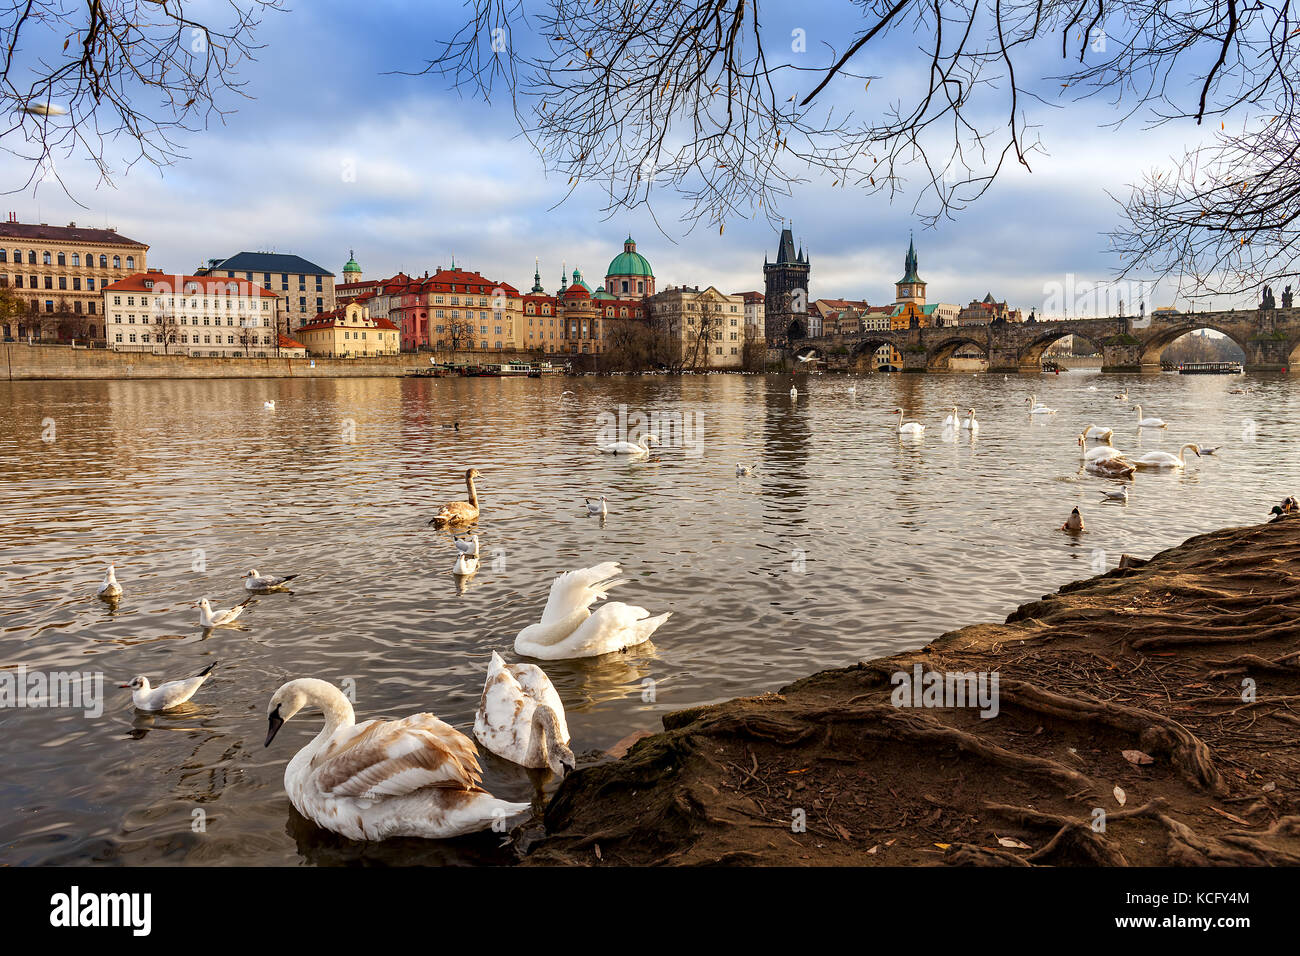 Swans on bank of Vltava river as Charles Bridge on background in Prague, Czech Republic. - Stock Image